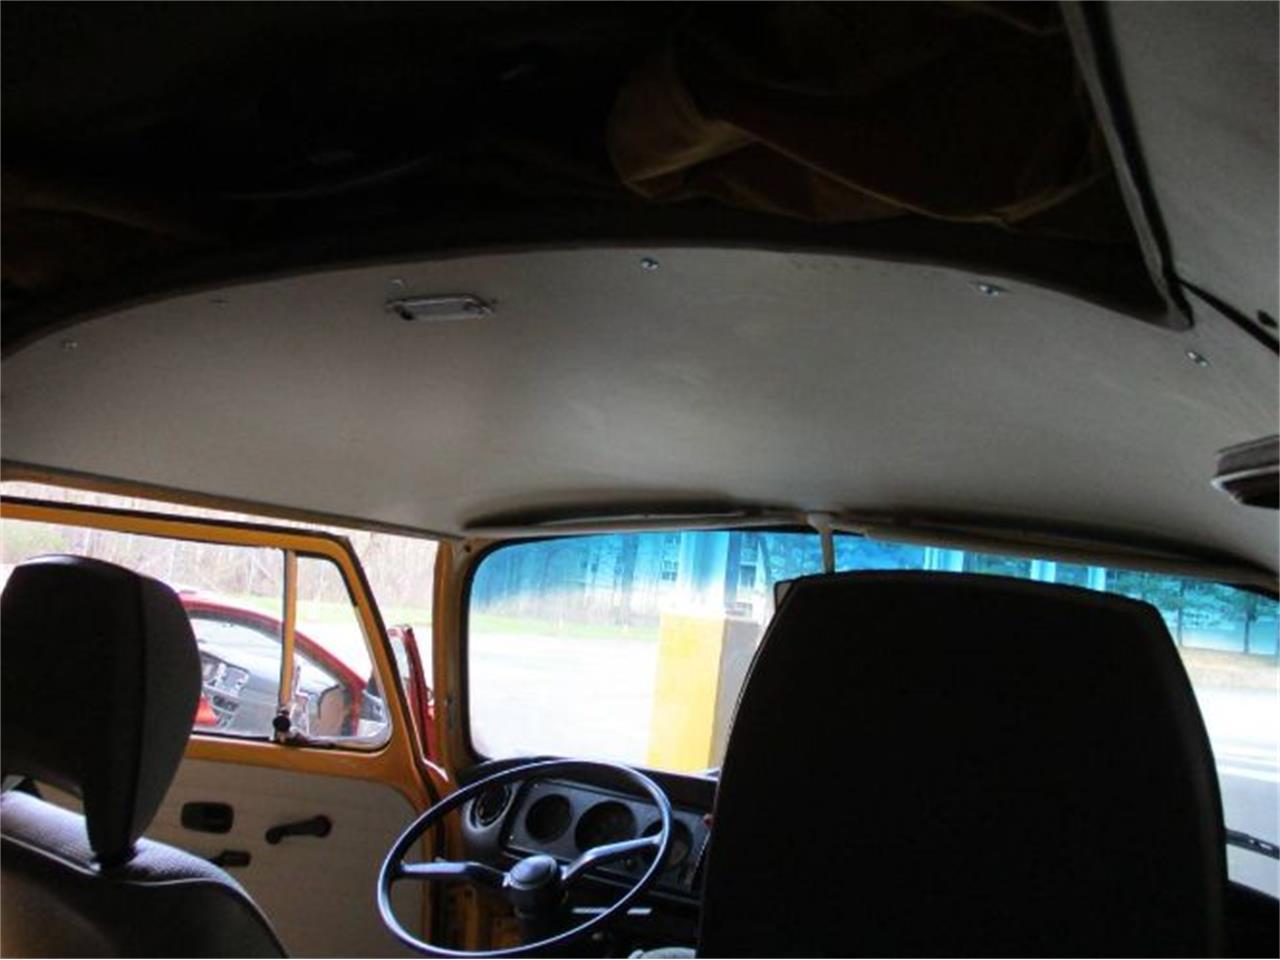 Large Picture of 1976 Volkswagen Westfalia Camper located in Cadillac Michigan - $35,495.00 - Q56J